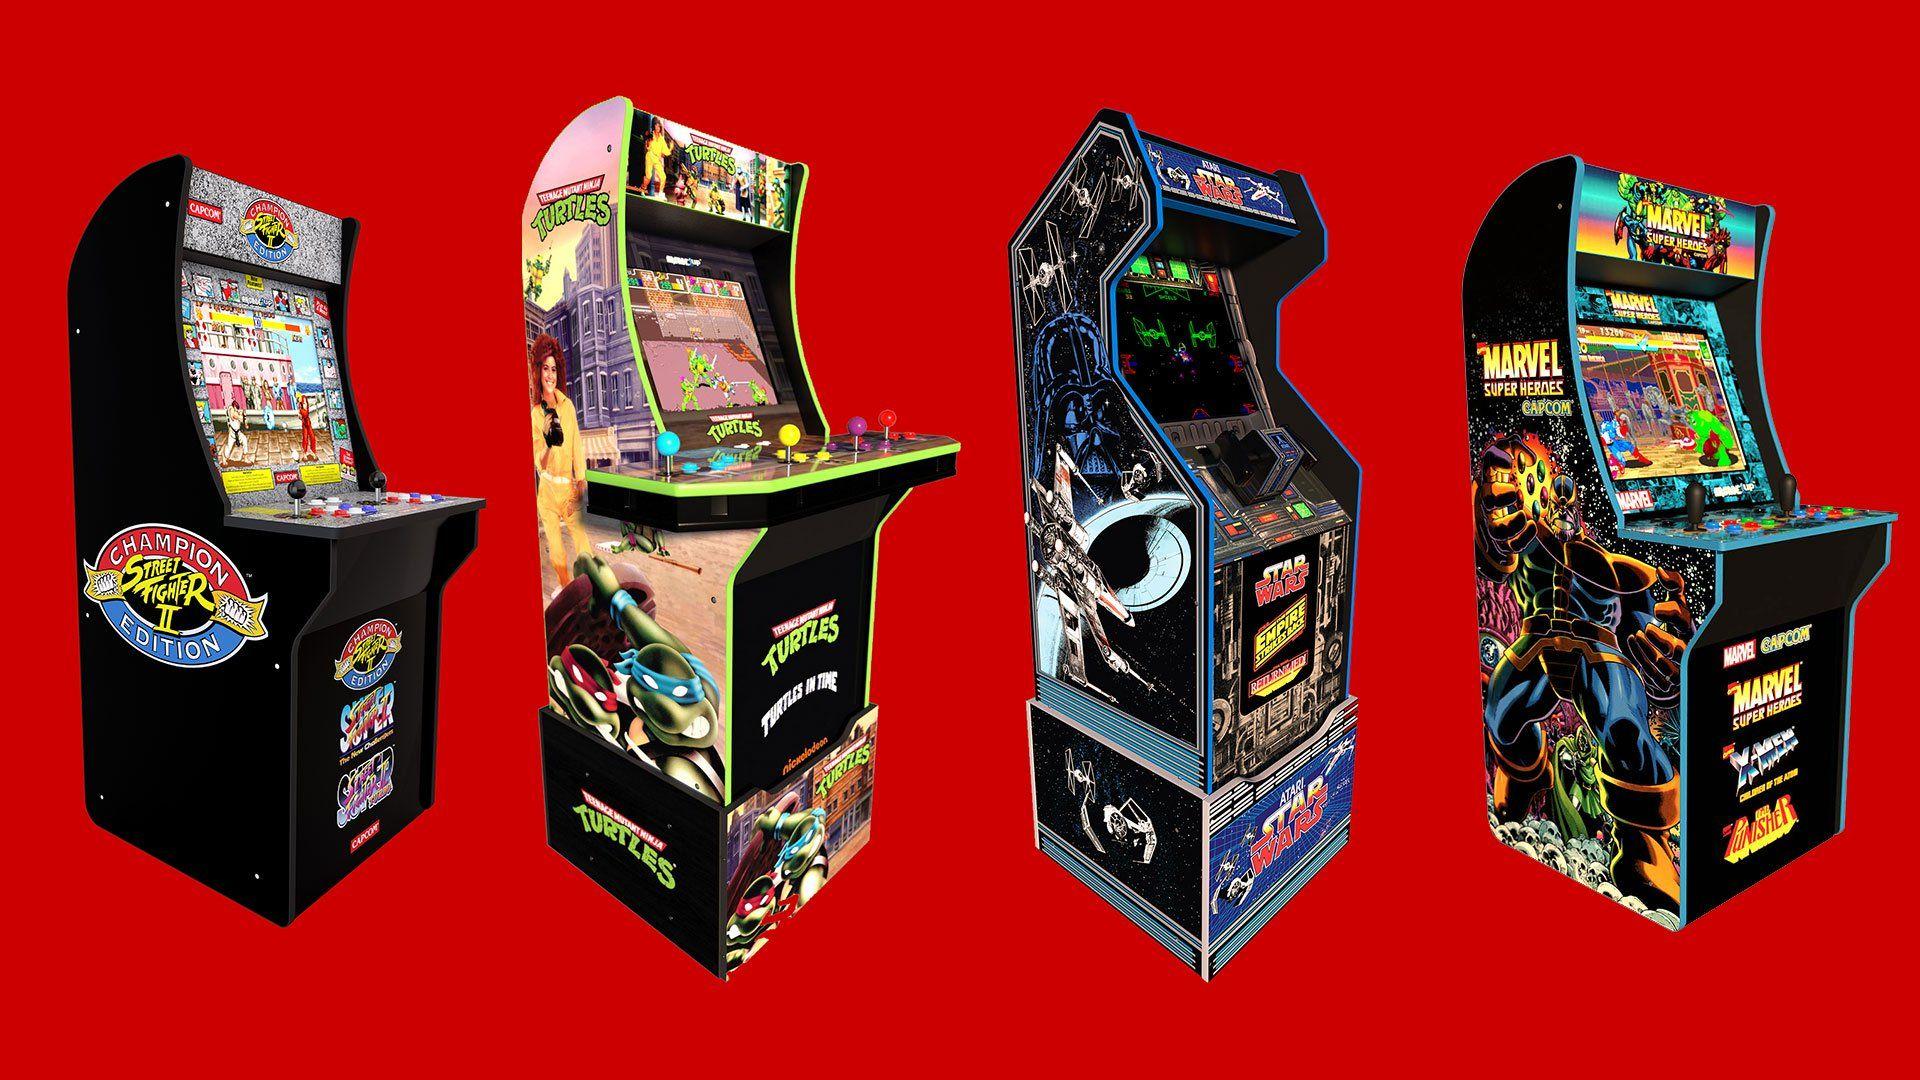 Arcade1up Arcade Cabinet Black Friday Deals Up To 100 Off Arcade Star Wars Game Street Fighter 2 Arcade